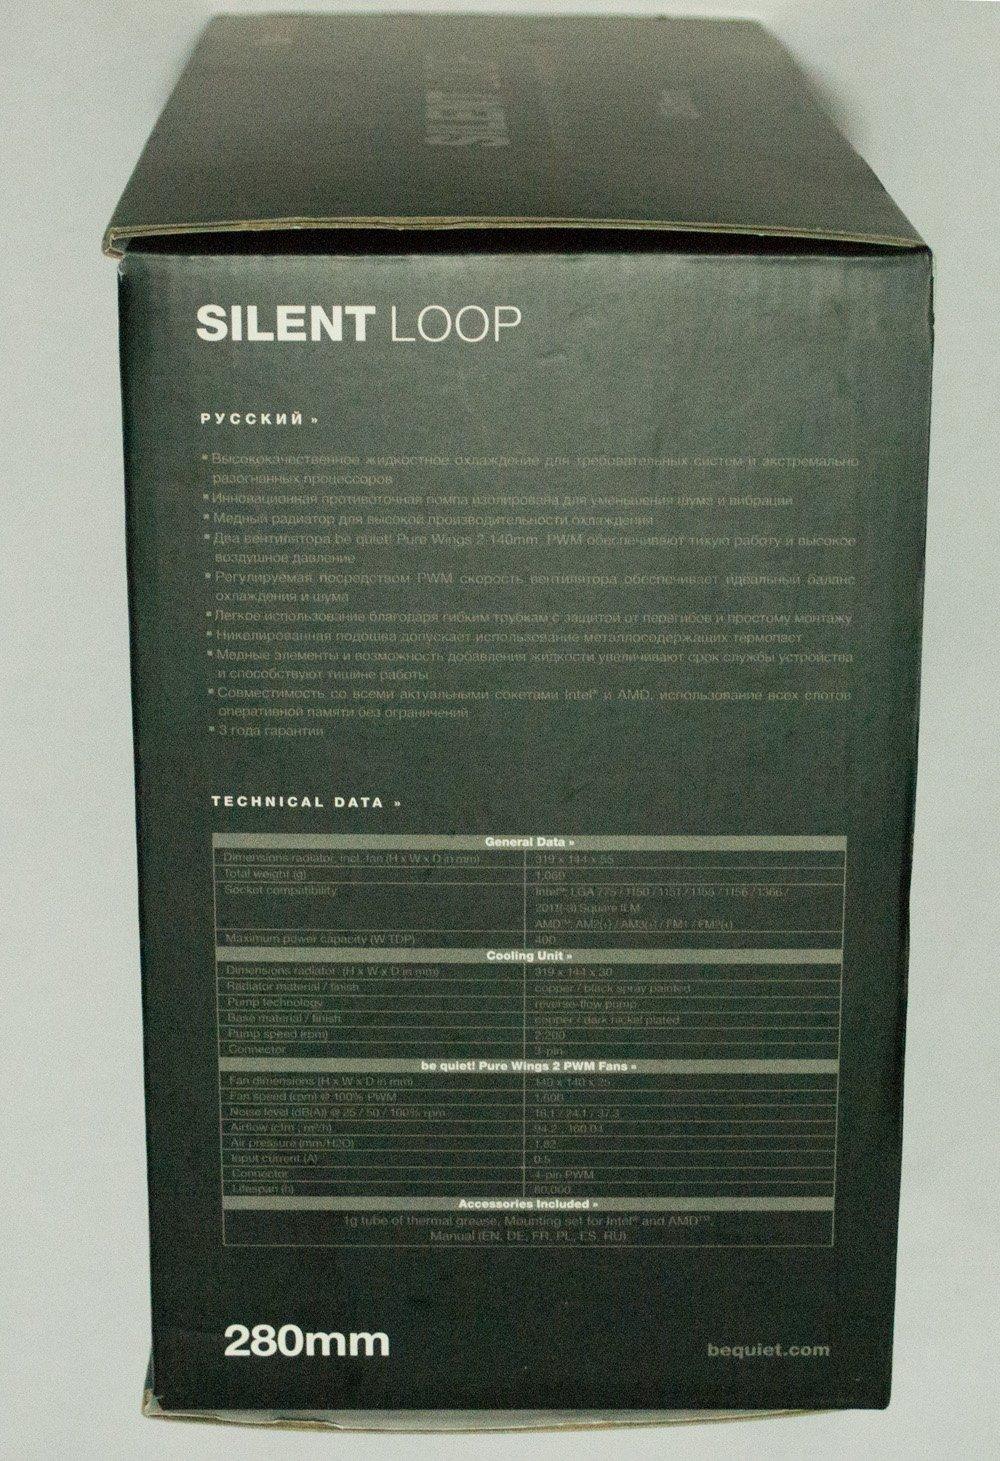 be-quiet-silent-loop-280mm-box-side